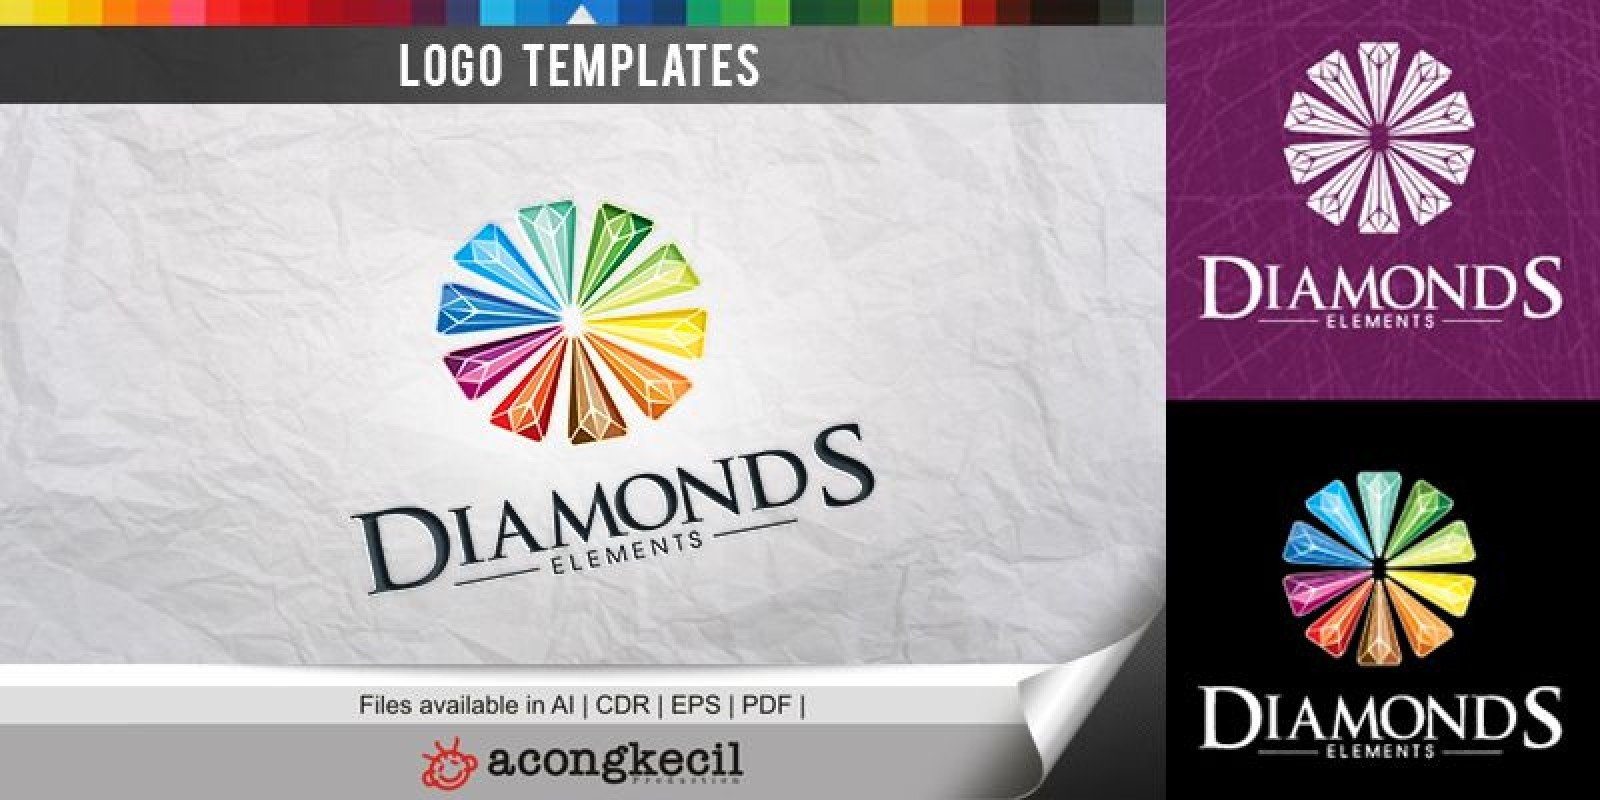 Diamonds - Logo Template